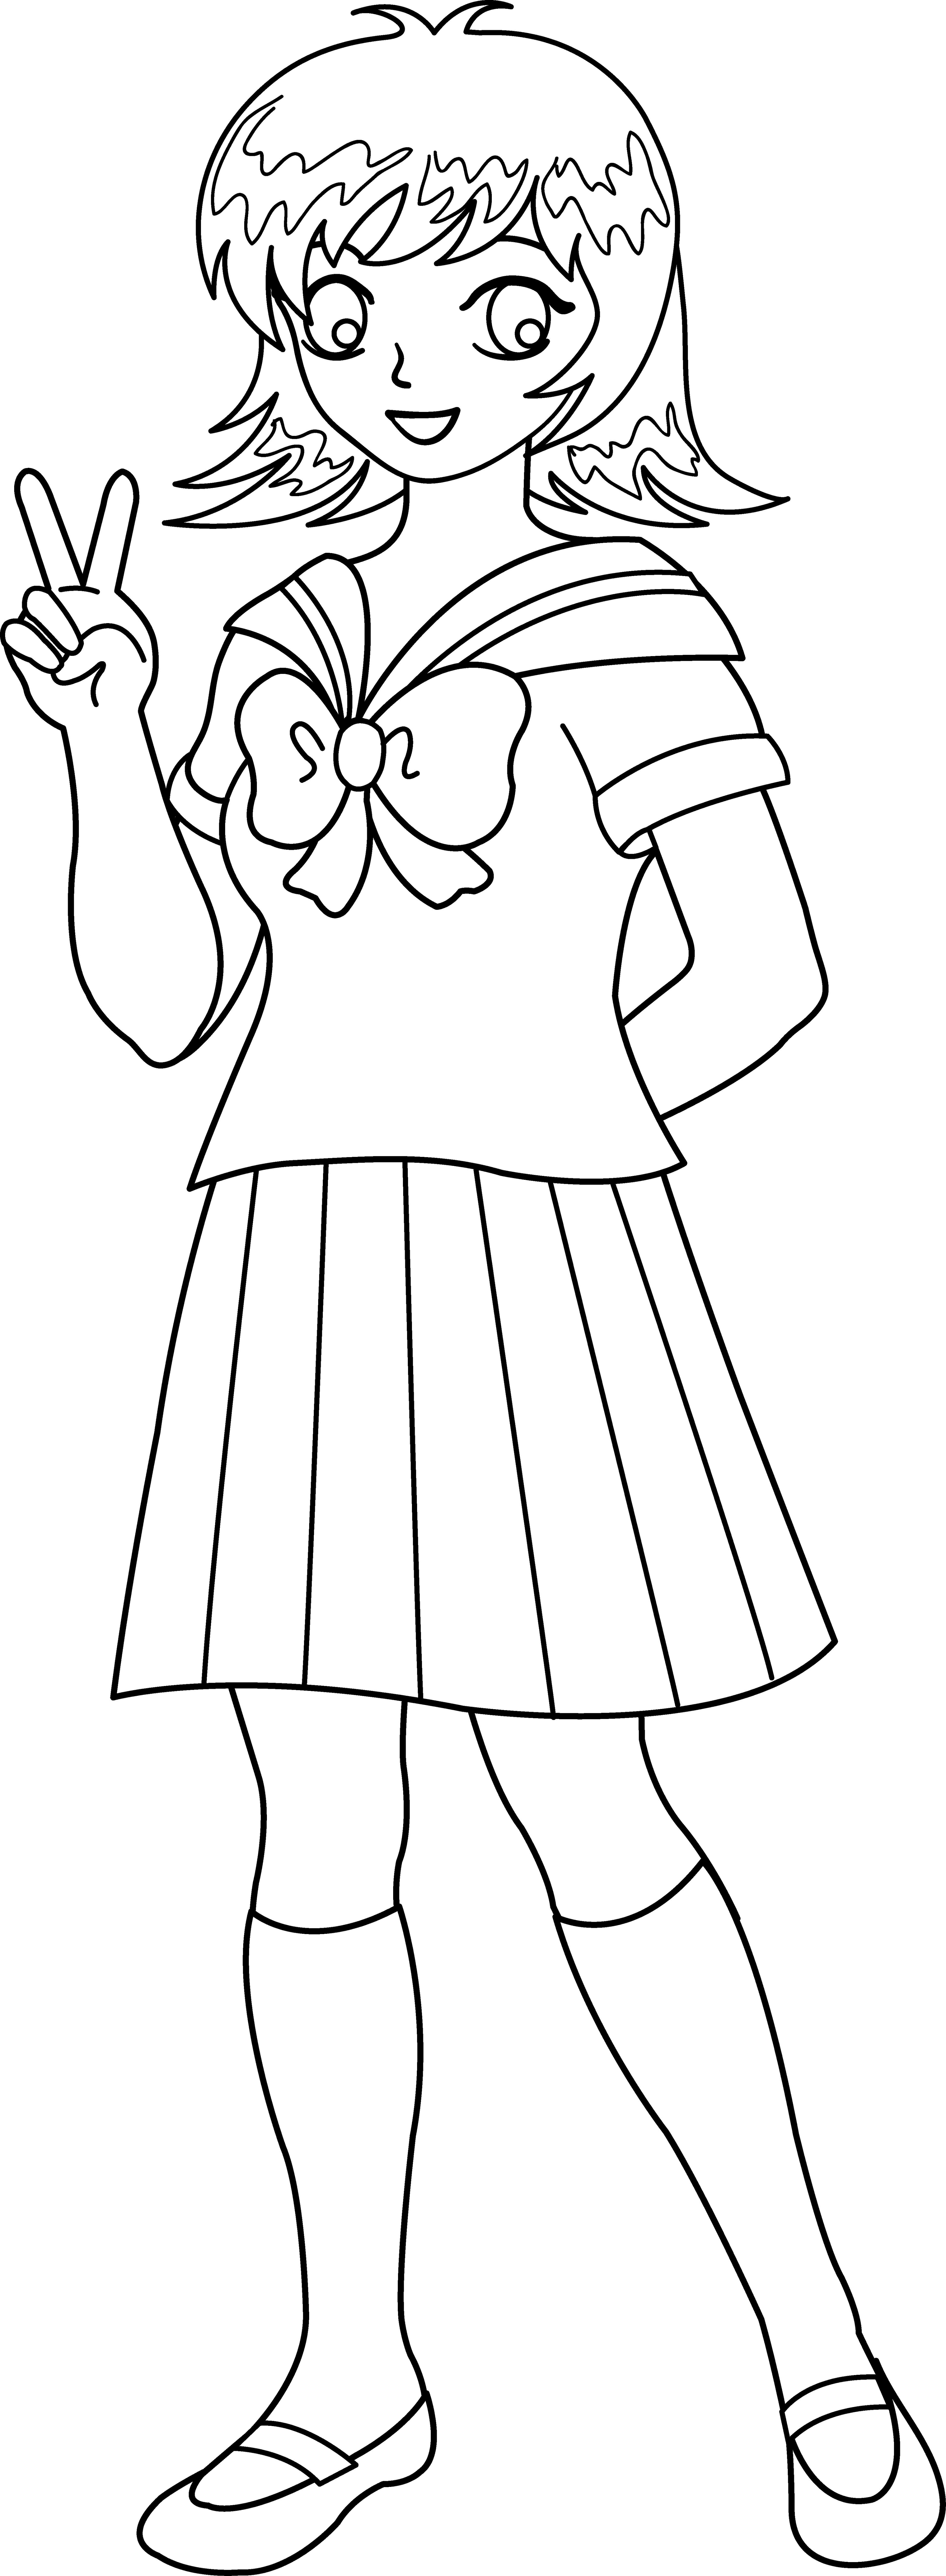 Girl clipart uniform. School line art clip